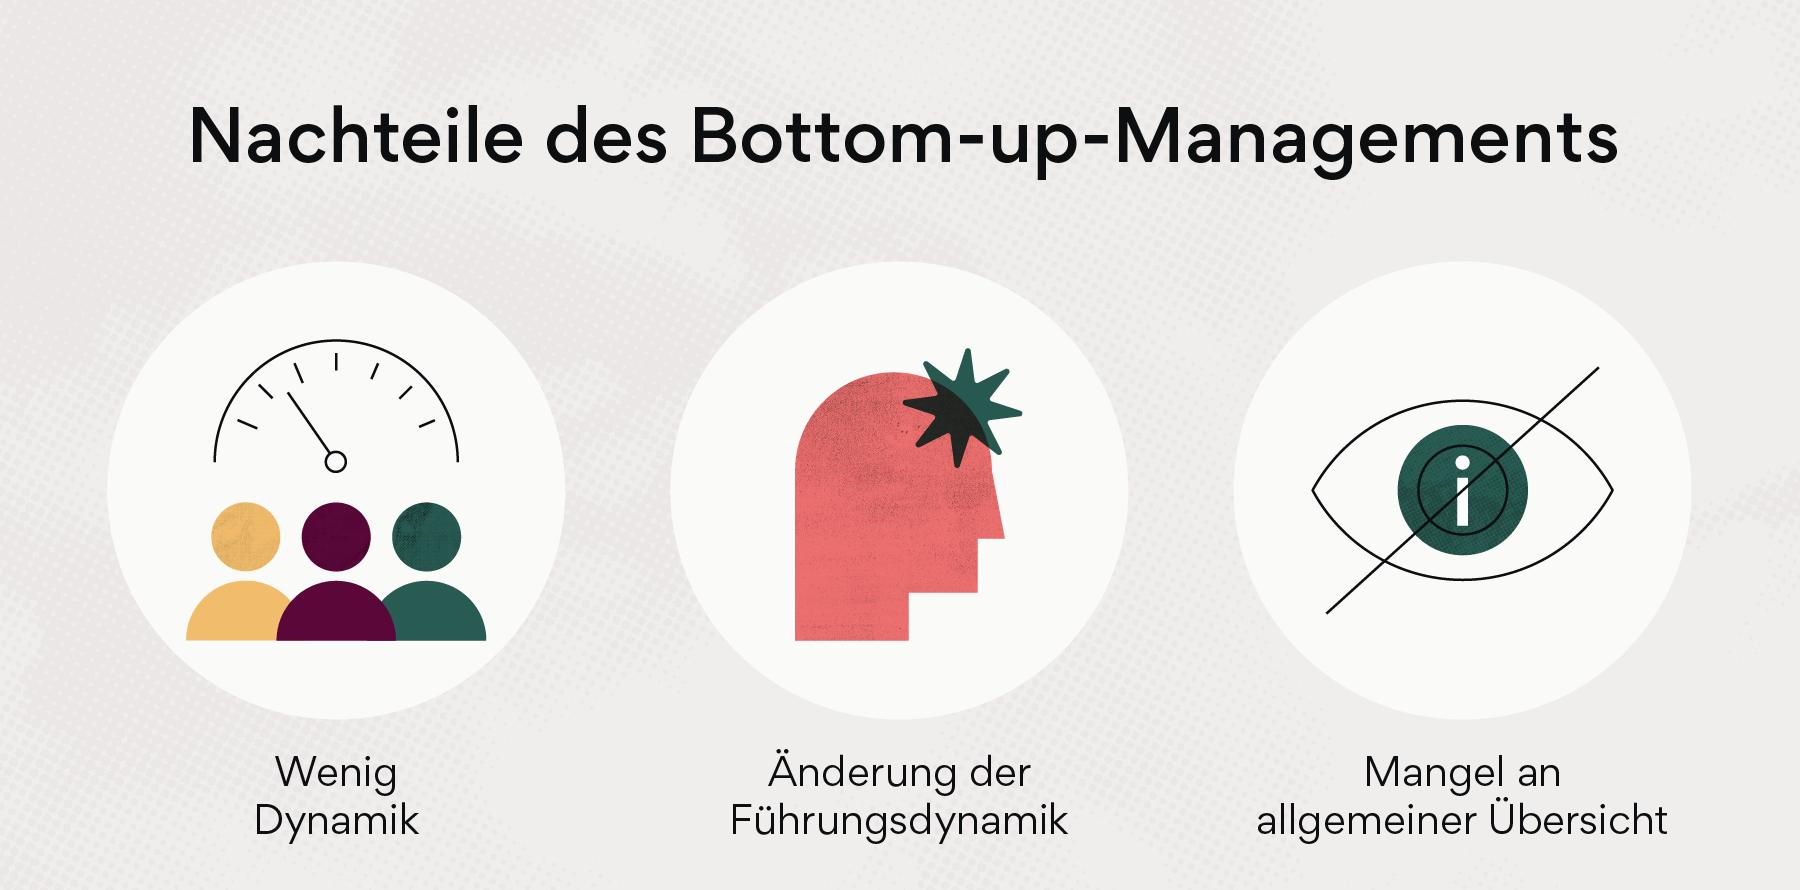 Nachteile des Bottom-Up-Managements